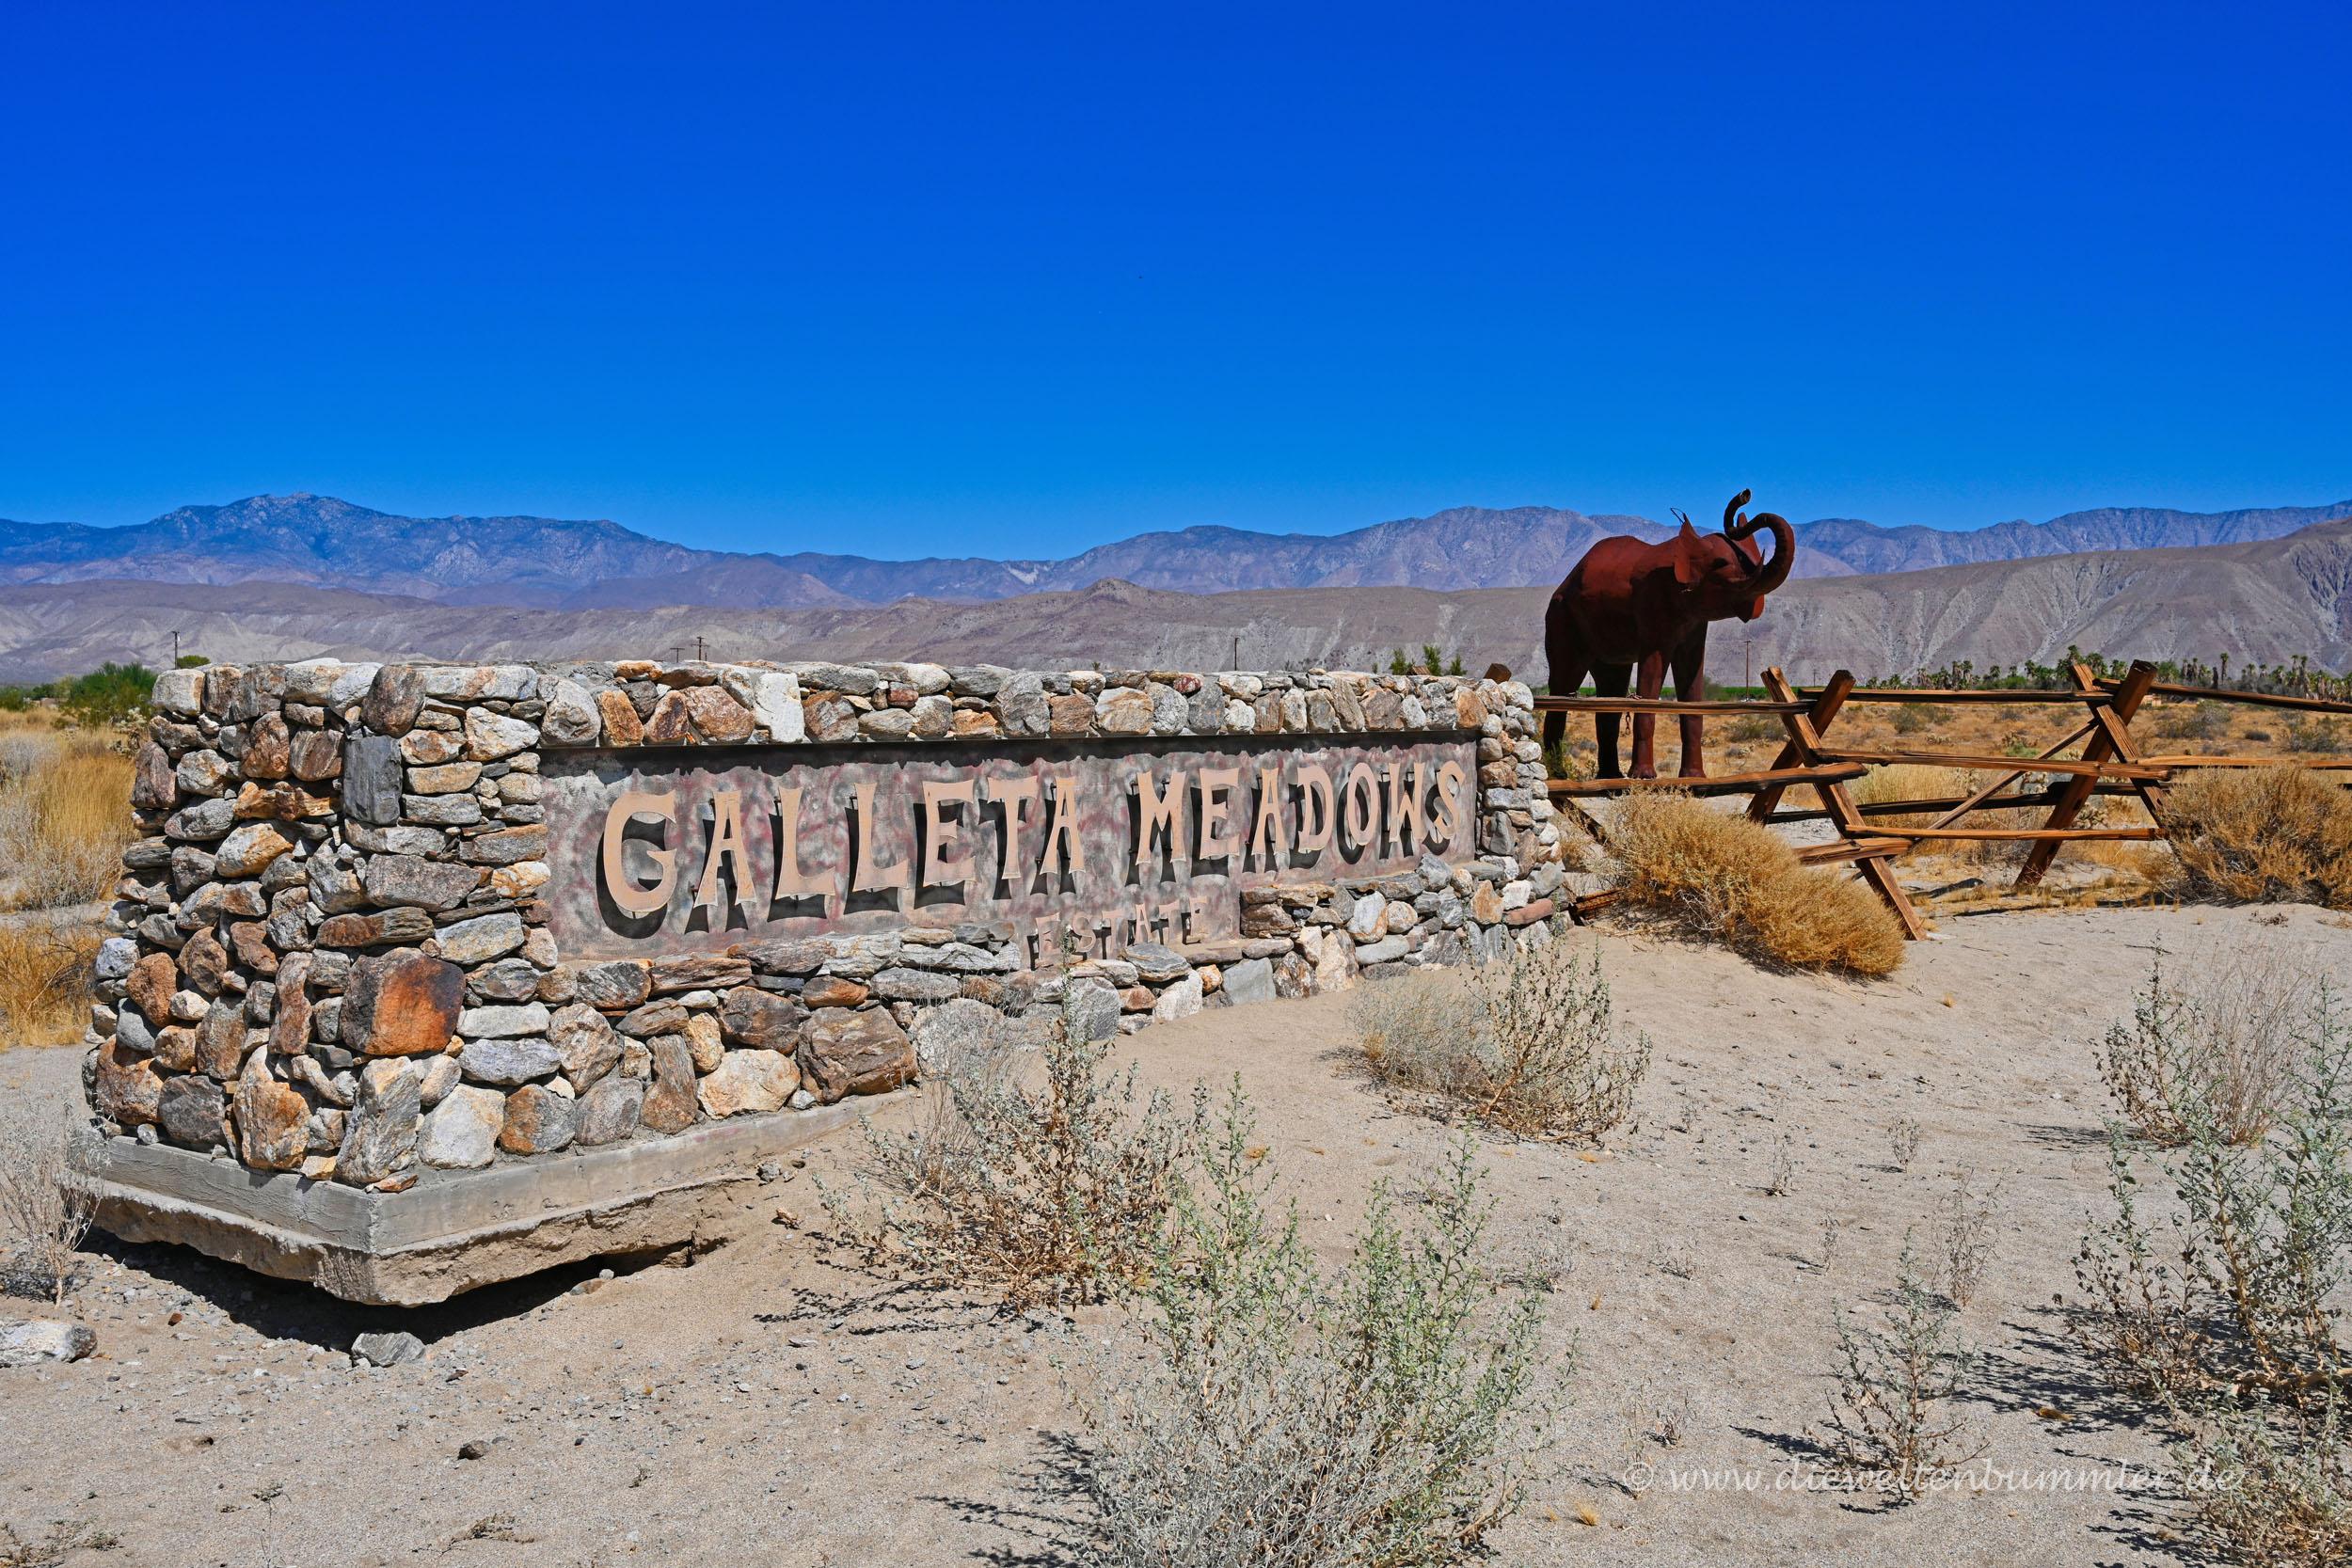 Galleta Meadows Estate